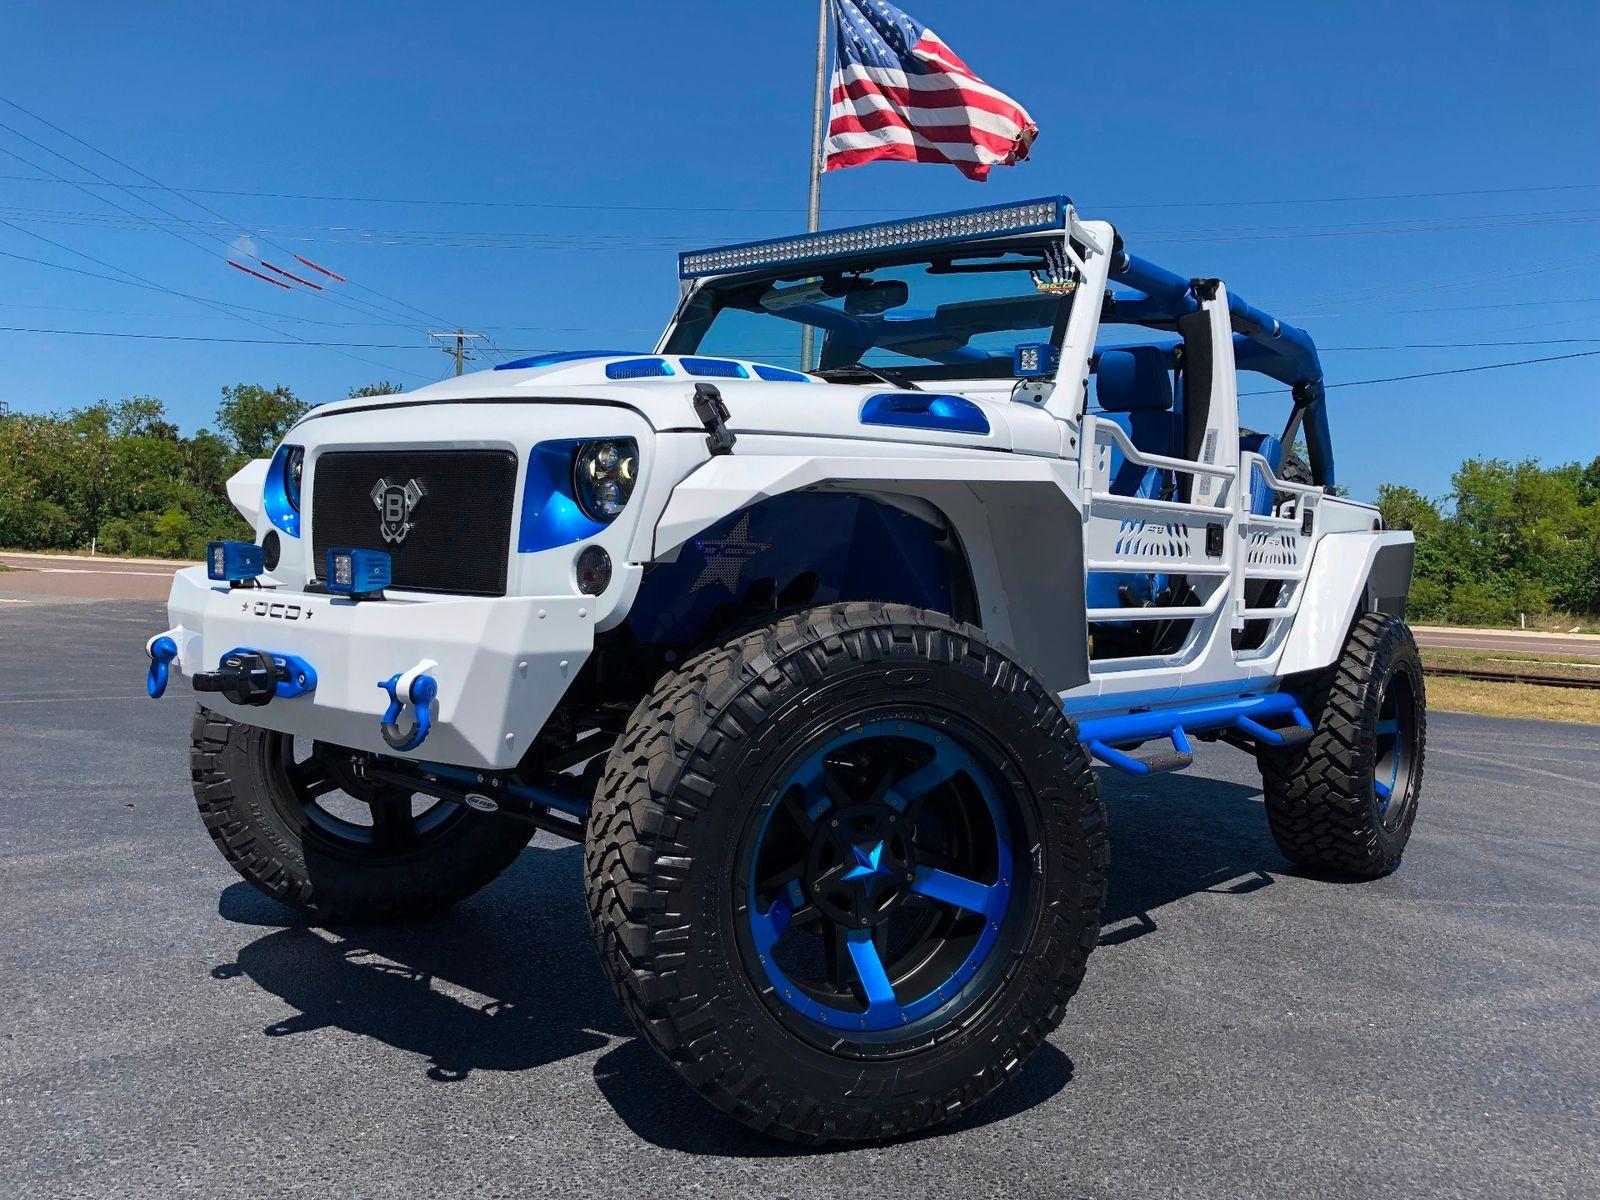 Hydro Blue Jeep Wrangler Unlimited >> 2018 Jeep Wrangler JK Unlimited CUSTOM WHITE N BLUE LIFTED LEATHER HARDTOP Florida Bayshore ...